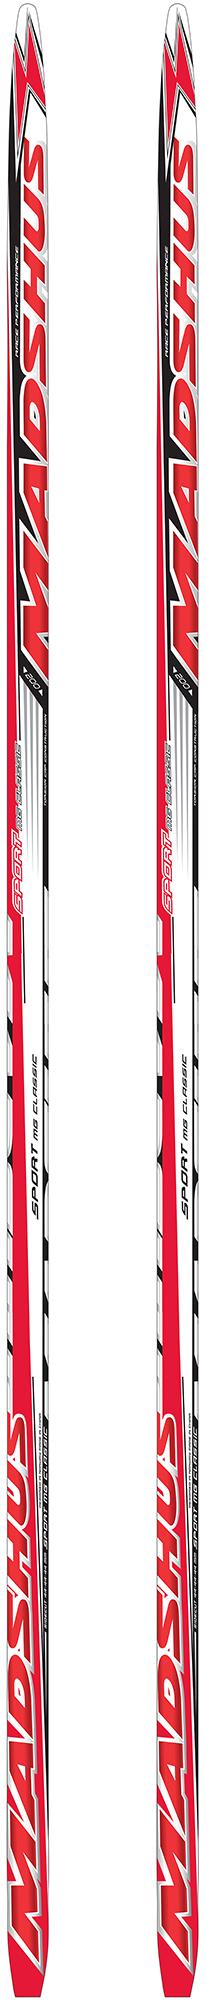 Madshus Беговые лыжи Madshus Sport Combi Mg, размер 210